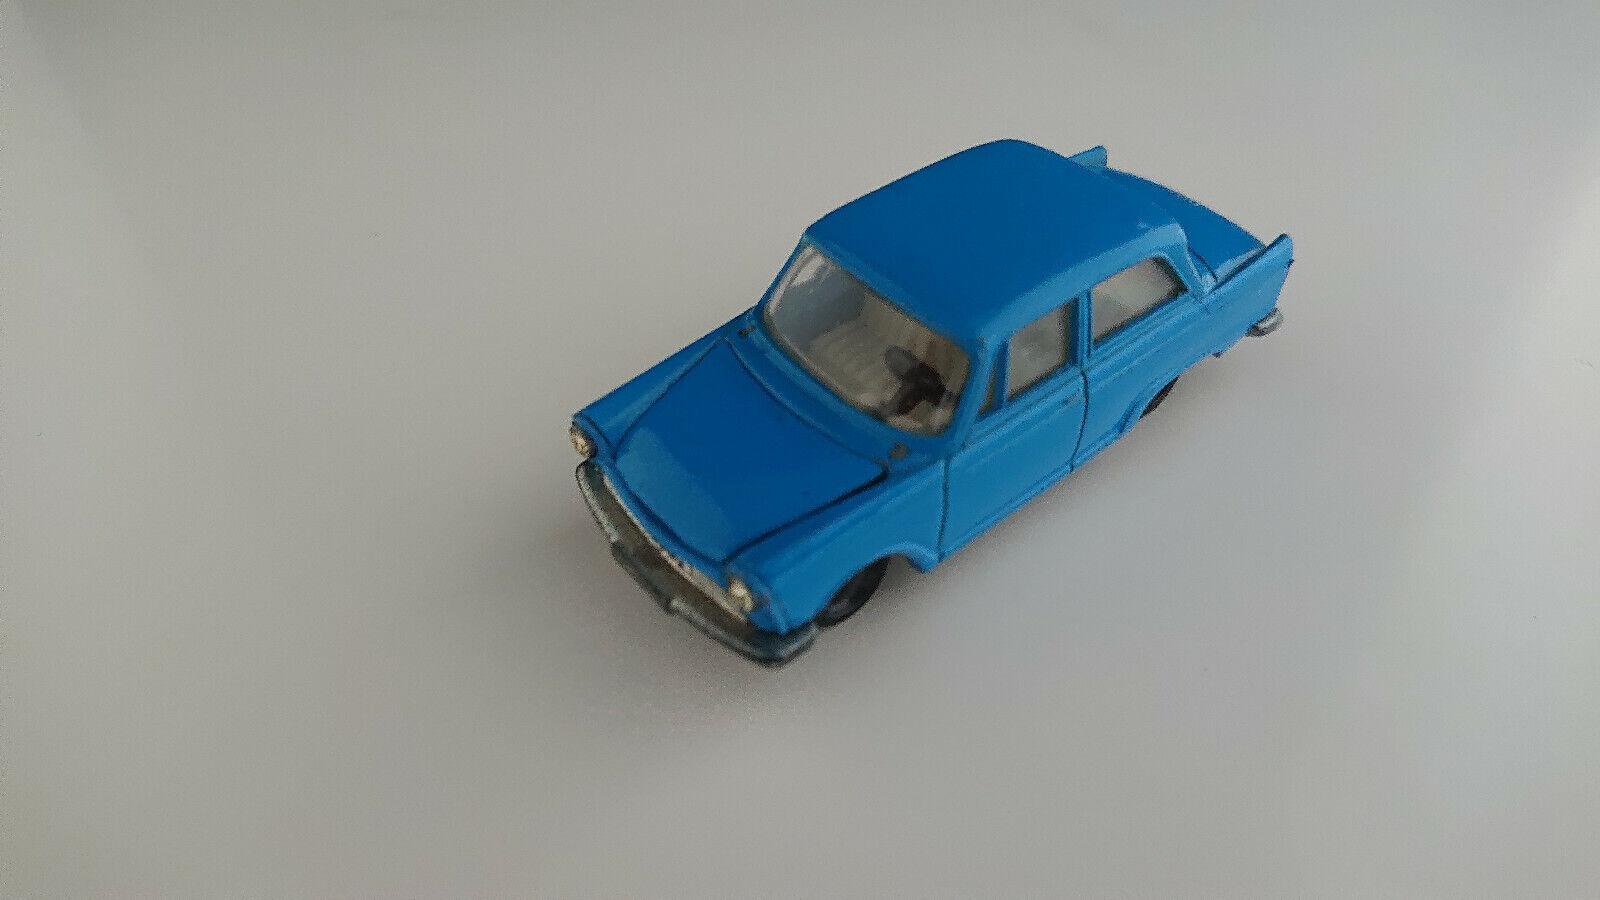 encuentra tu favorito aquí Siku V-serie v224 DKW f12 f12 f12 azul cielo  ahorra hasta un 80%